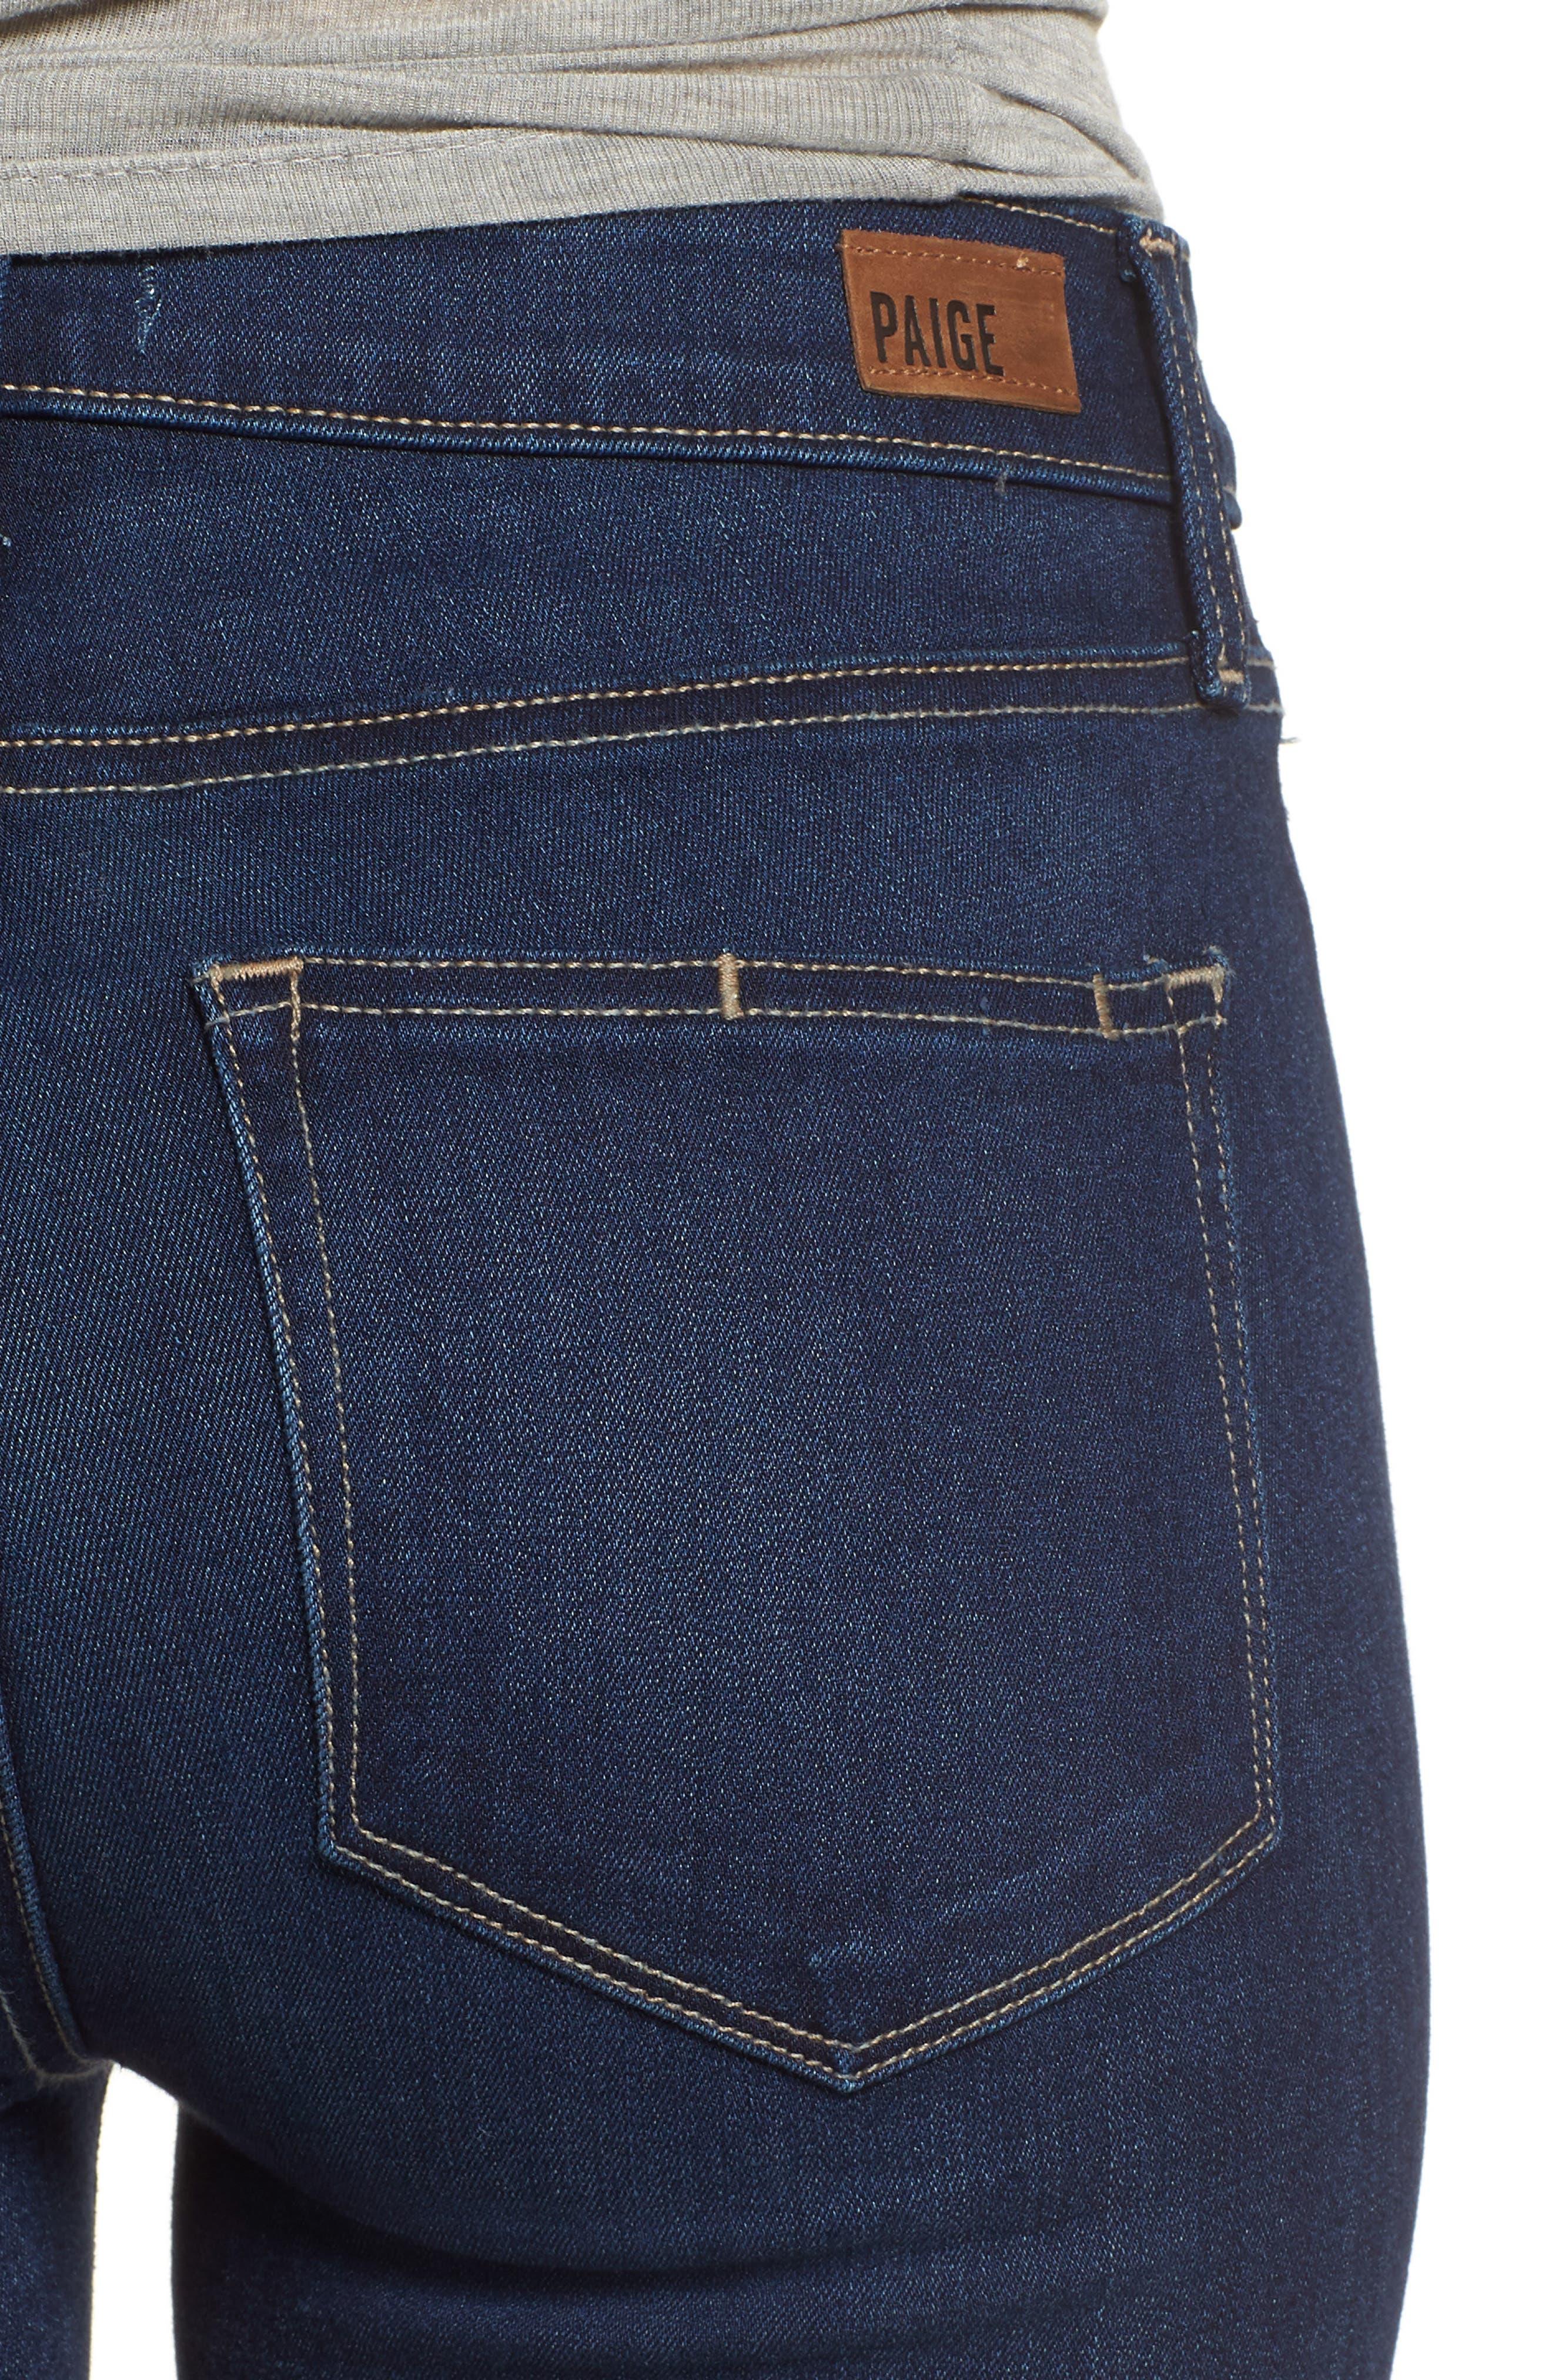 Hoxton High Waist Ankle Skinny Jeans,                             Alternate thumbnail 4, color,                             400